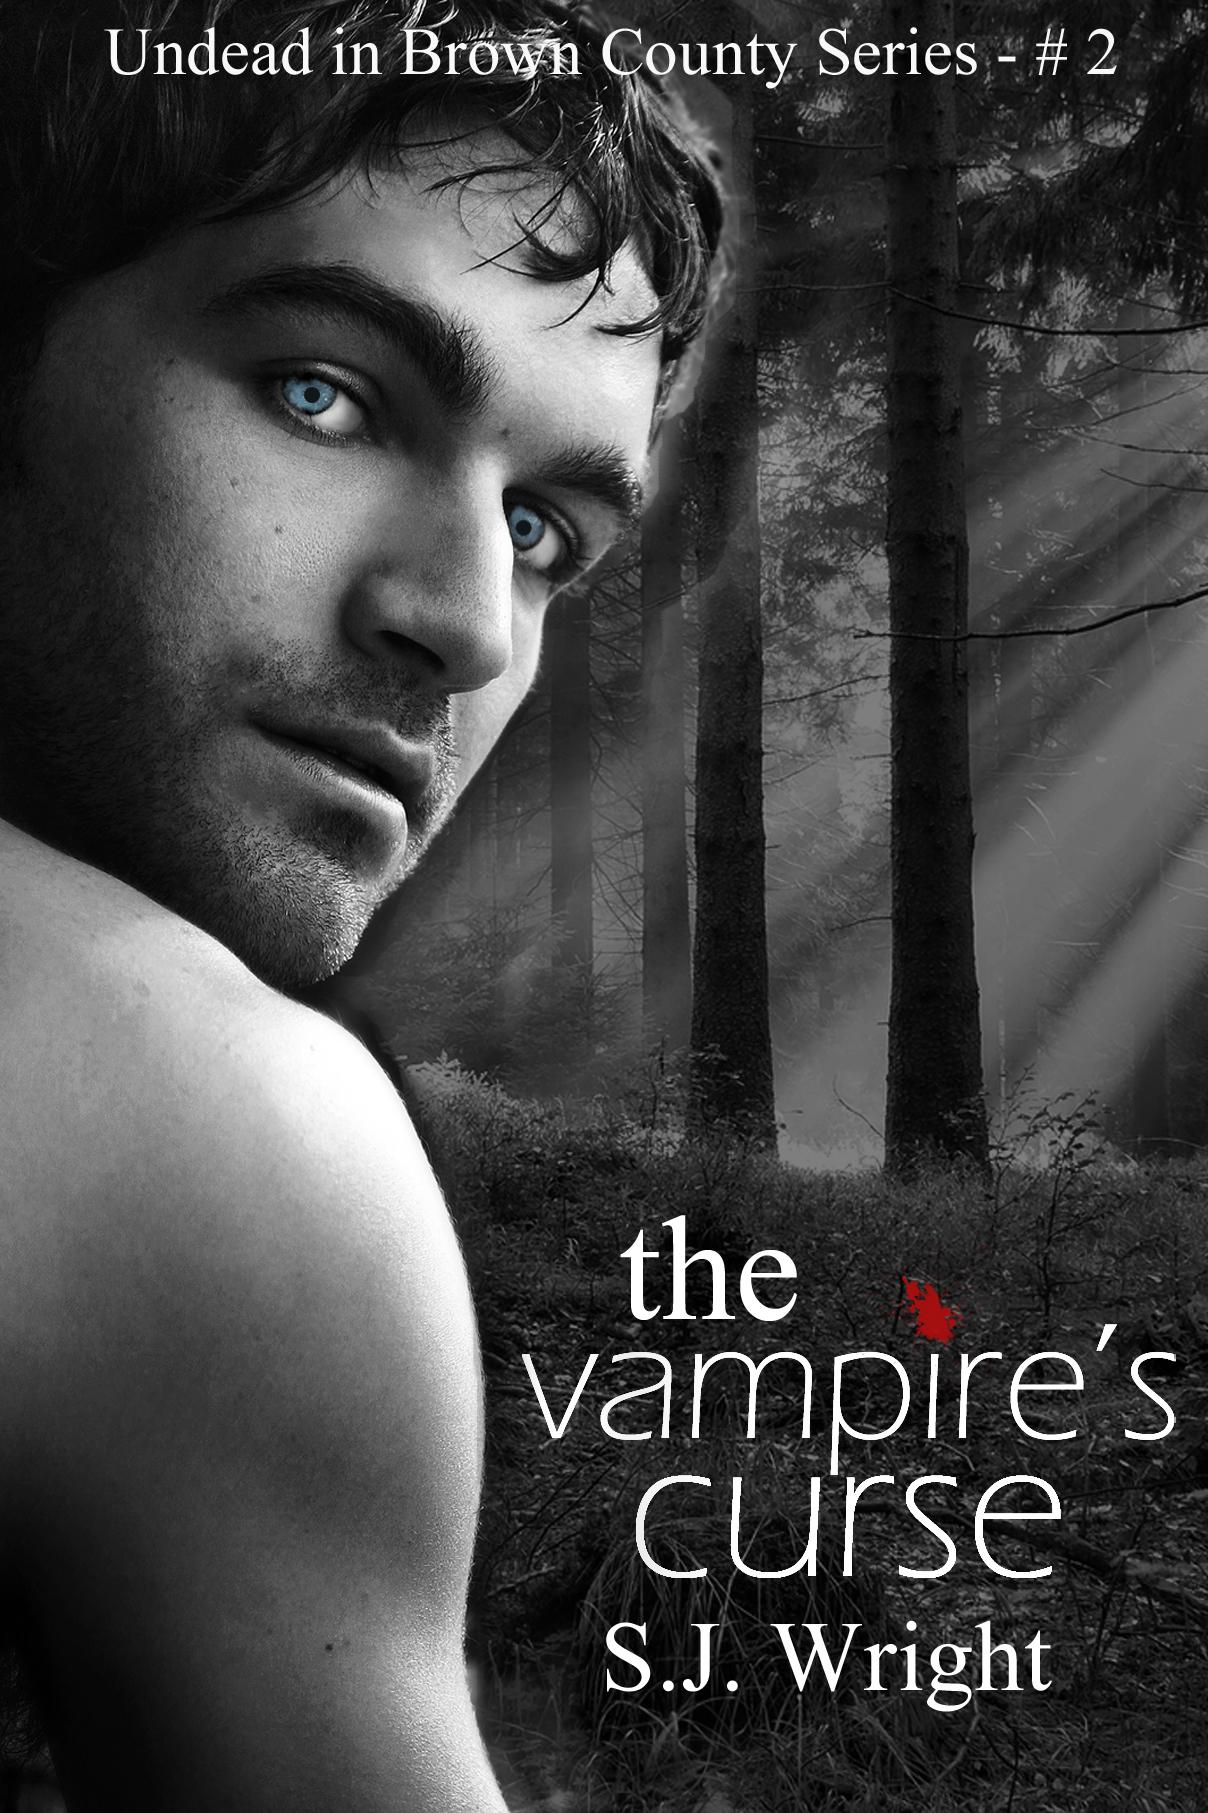 The Vampire's Curse